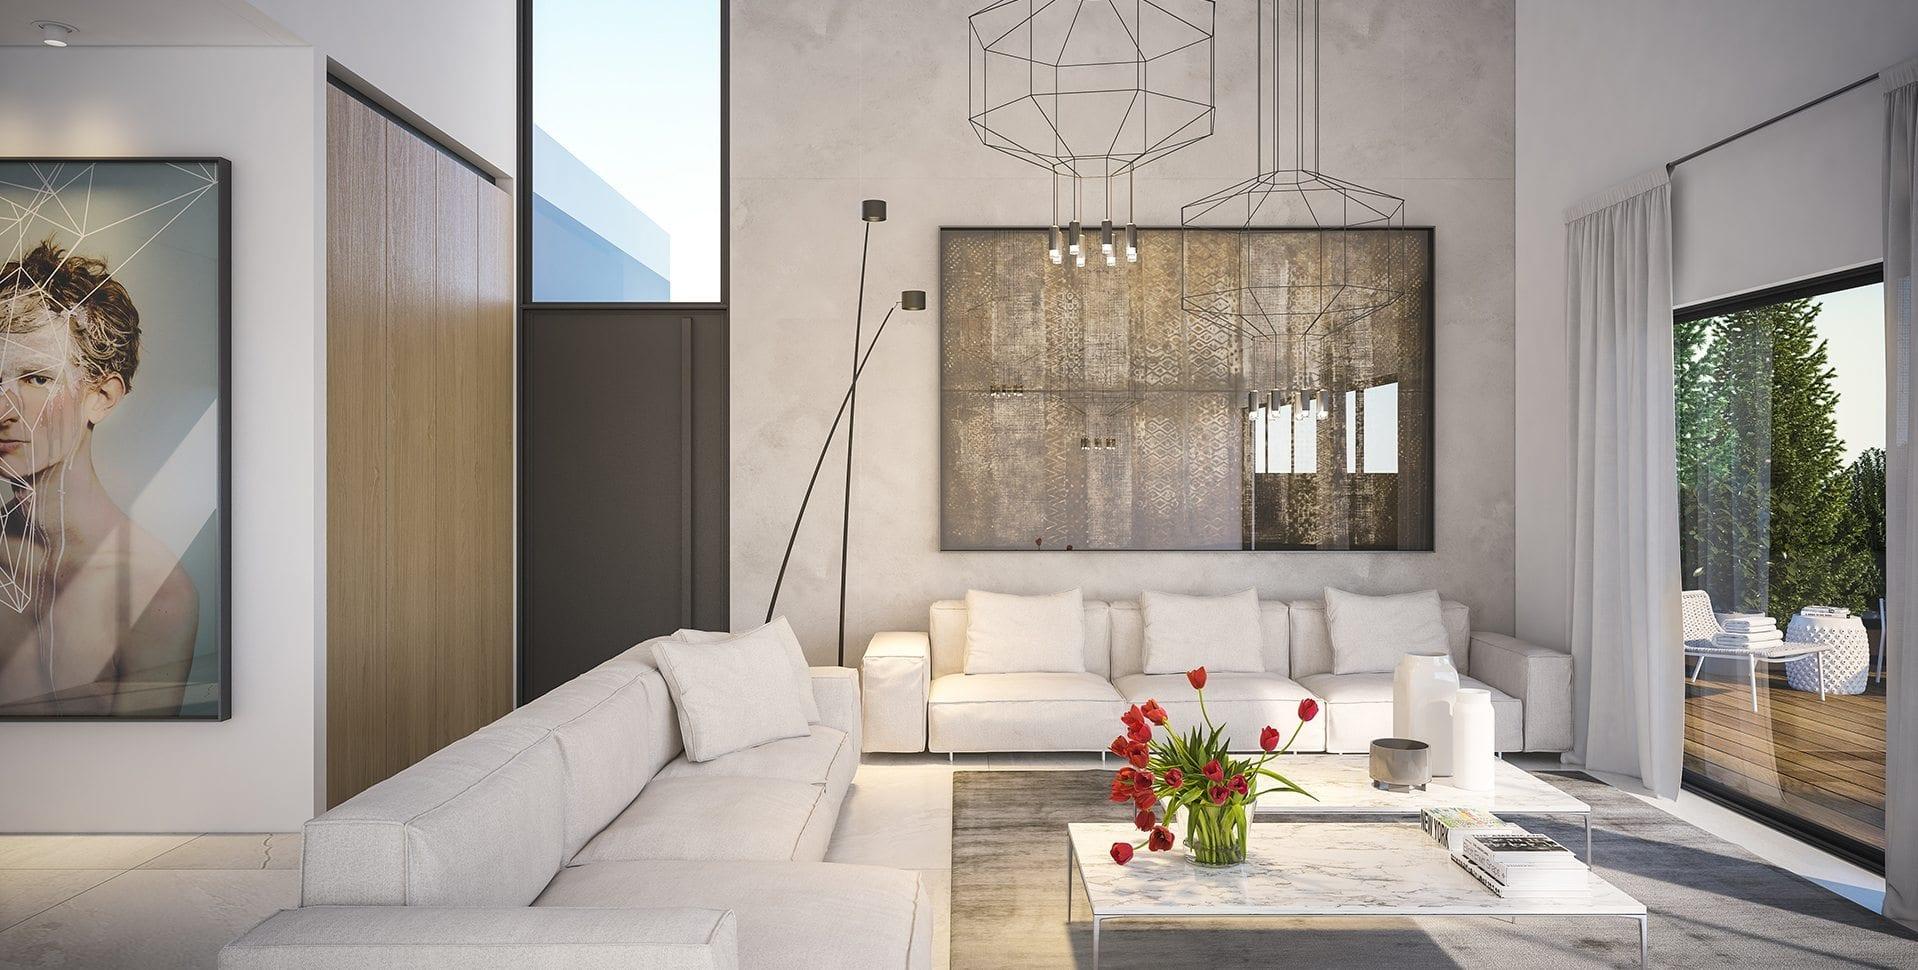 Maayan-Golan_Architectural-Visualization_house-interior-visualization_living-room_hardof-el-yam_ Rosh-Pina_03